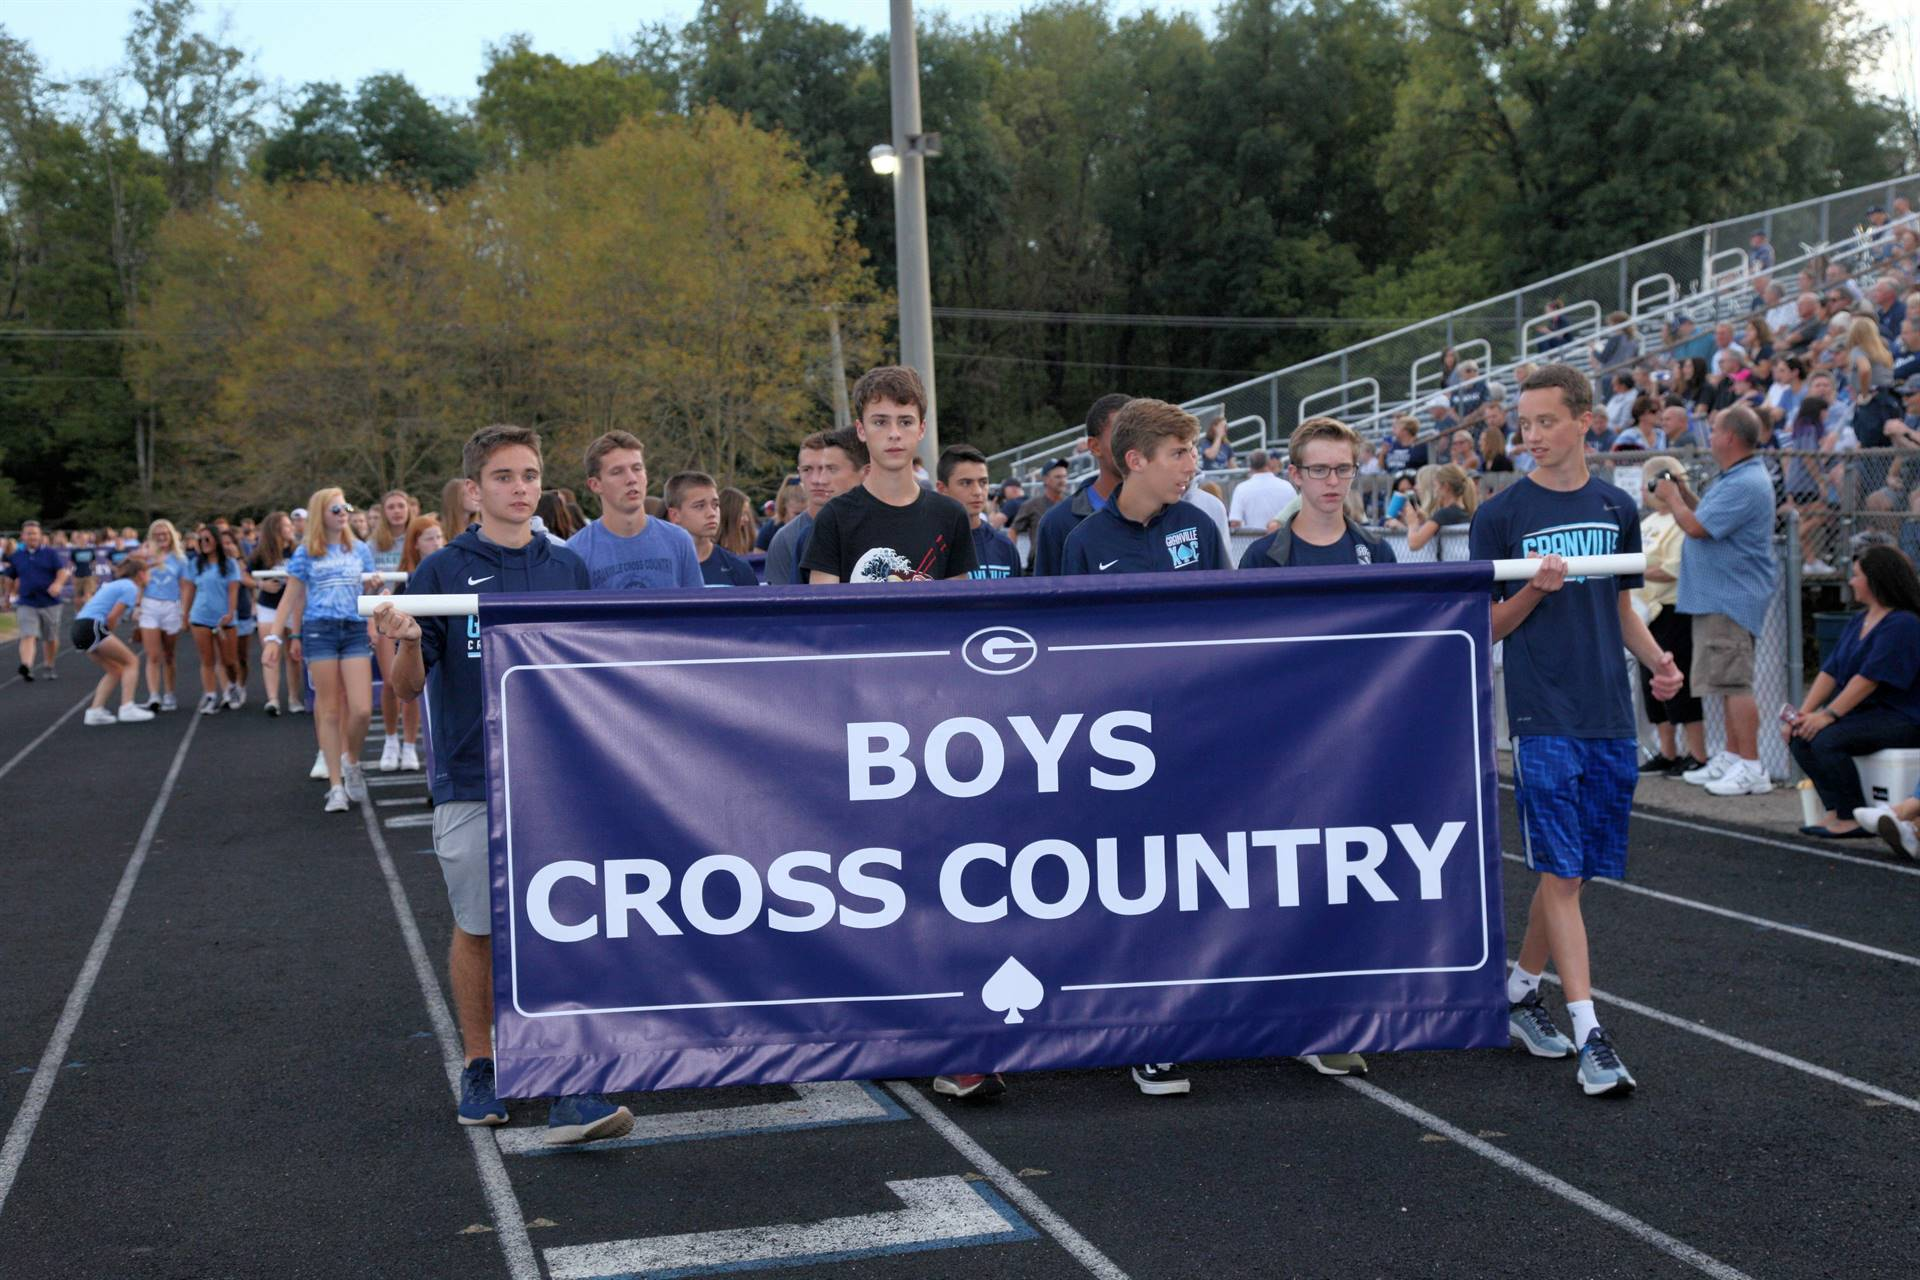 Boys Cross Country